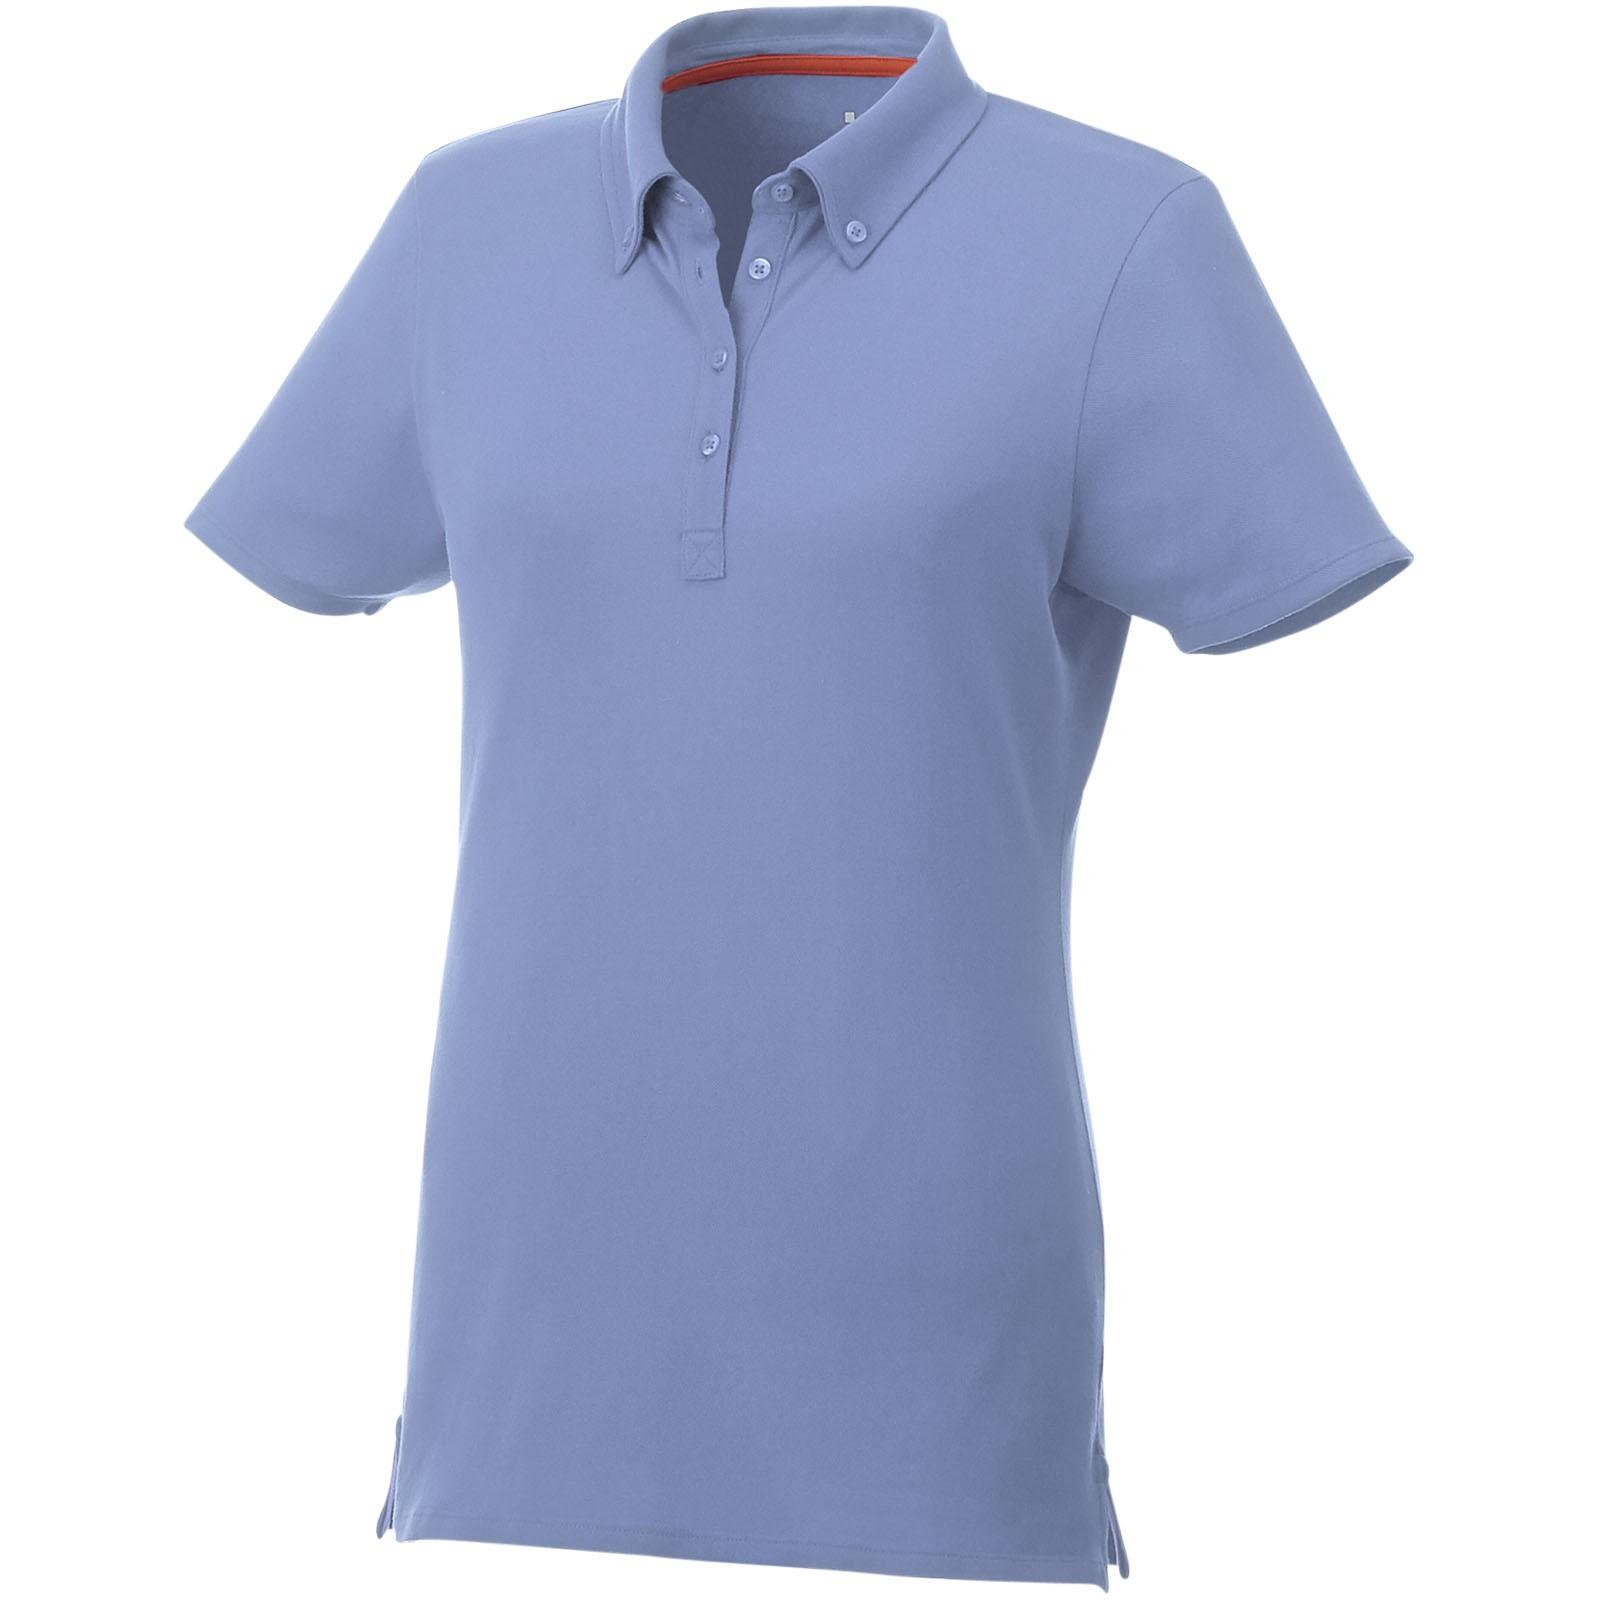 Atkinson short sleeve button-down women's polo - Light Blue / S